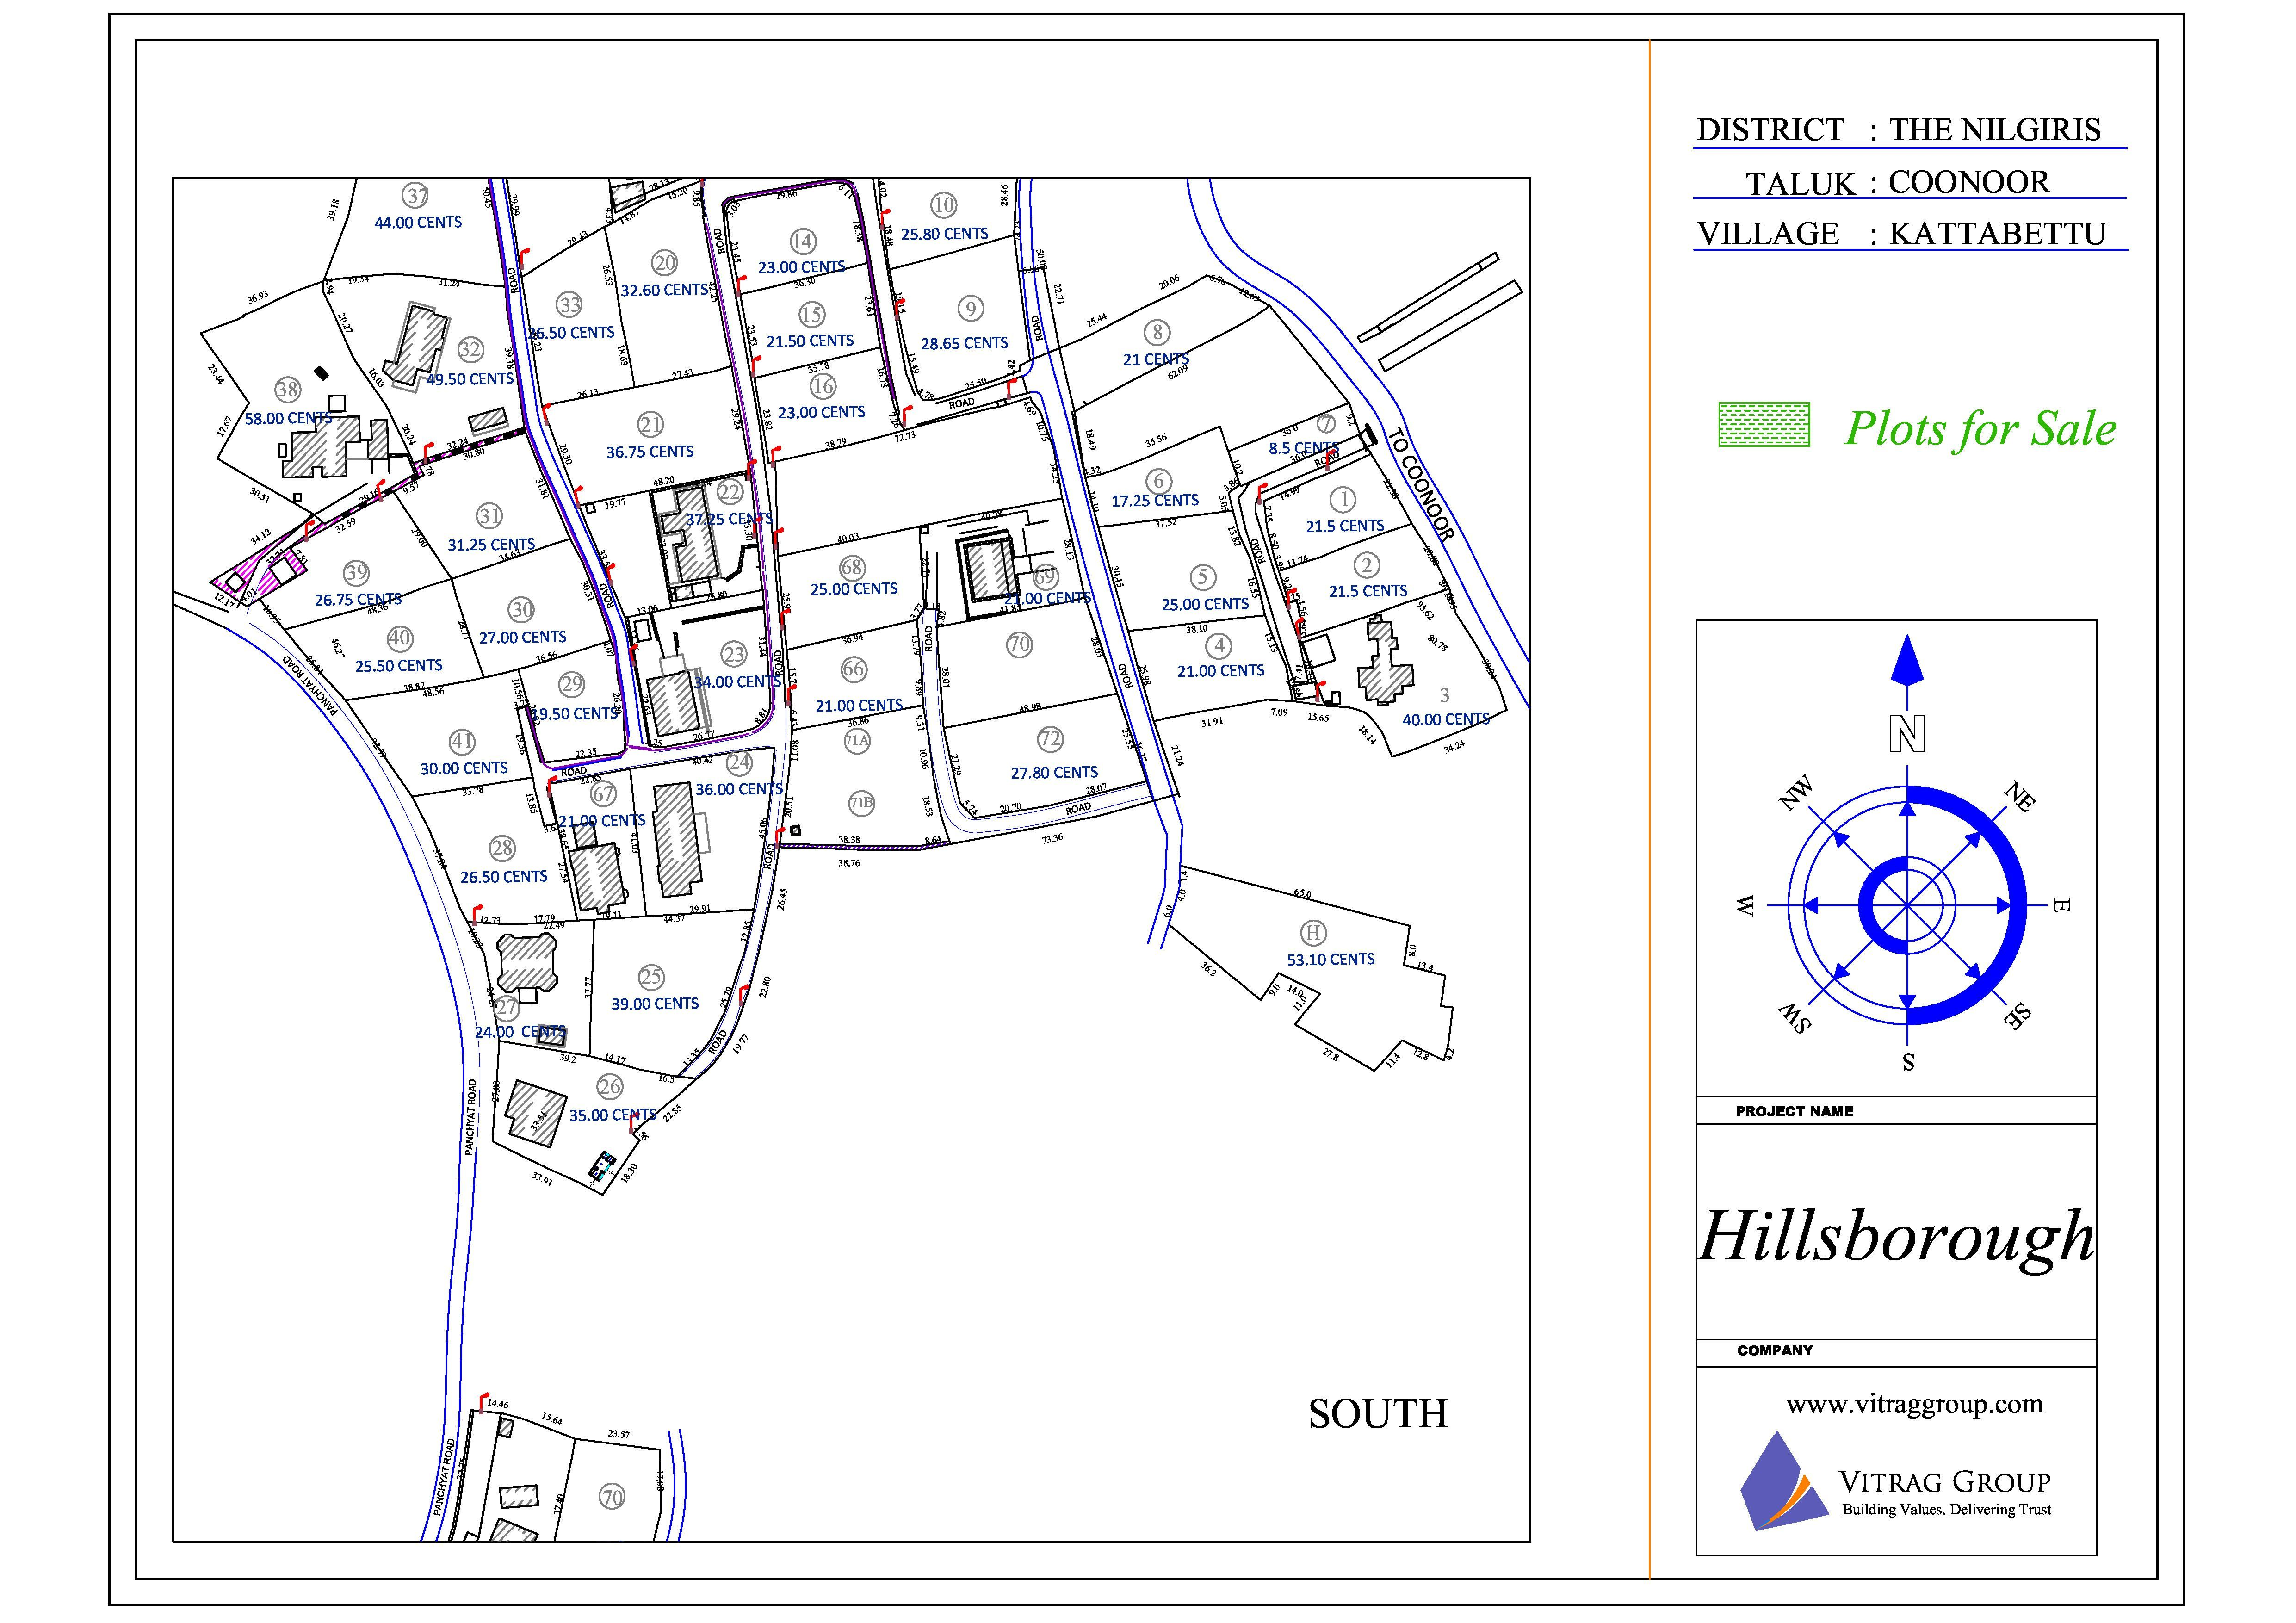 Hillsborough South